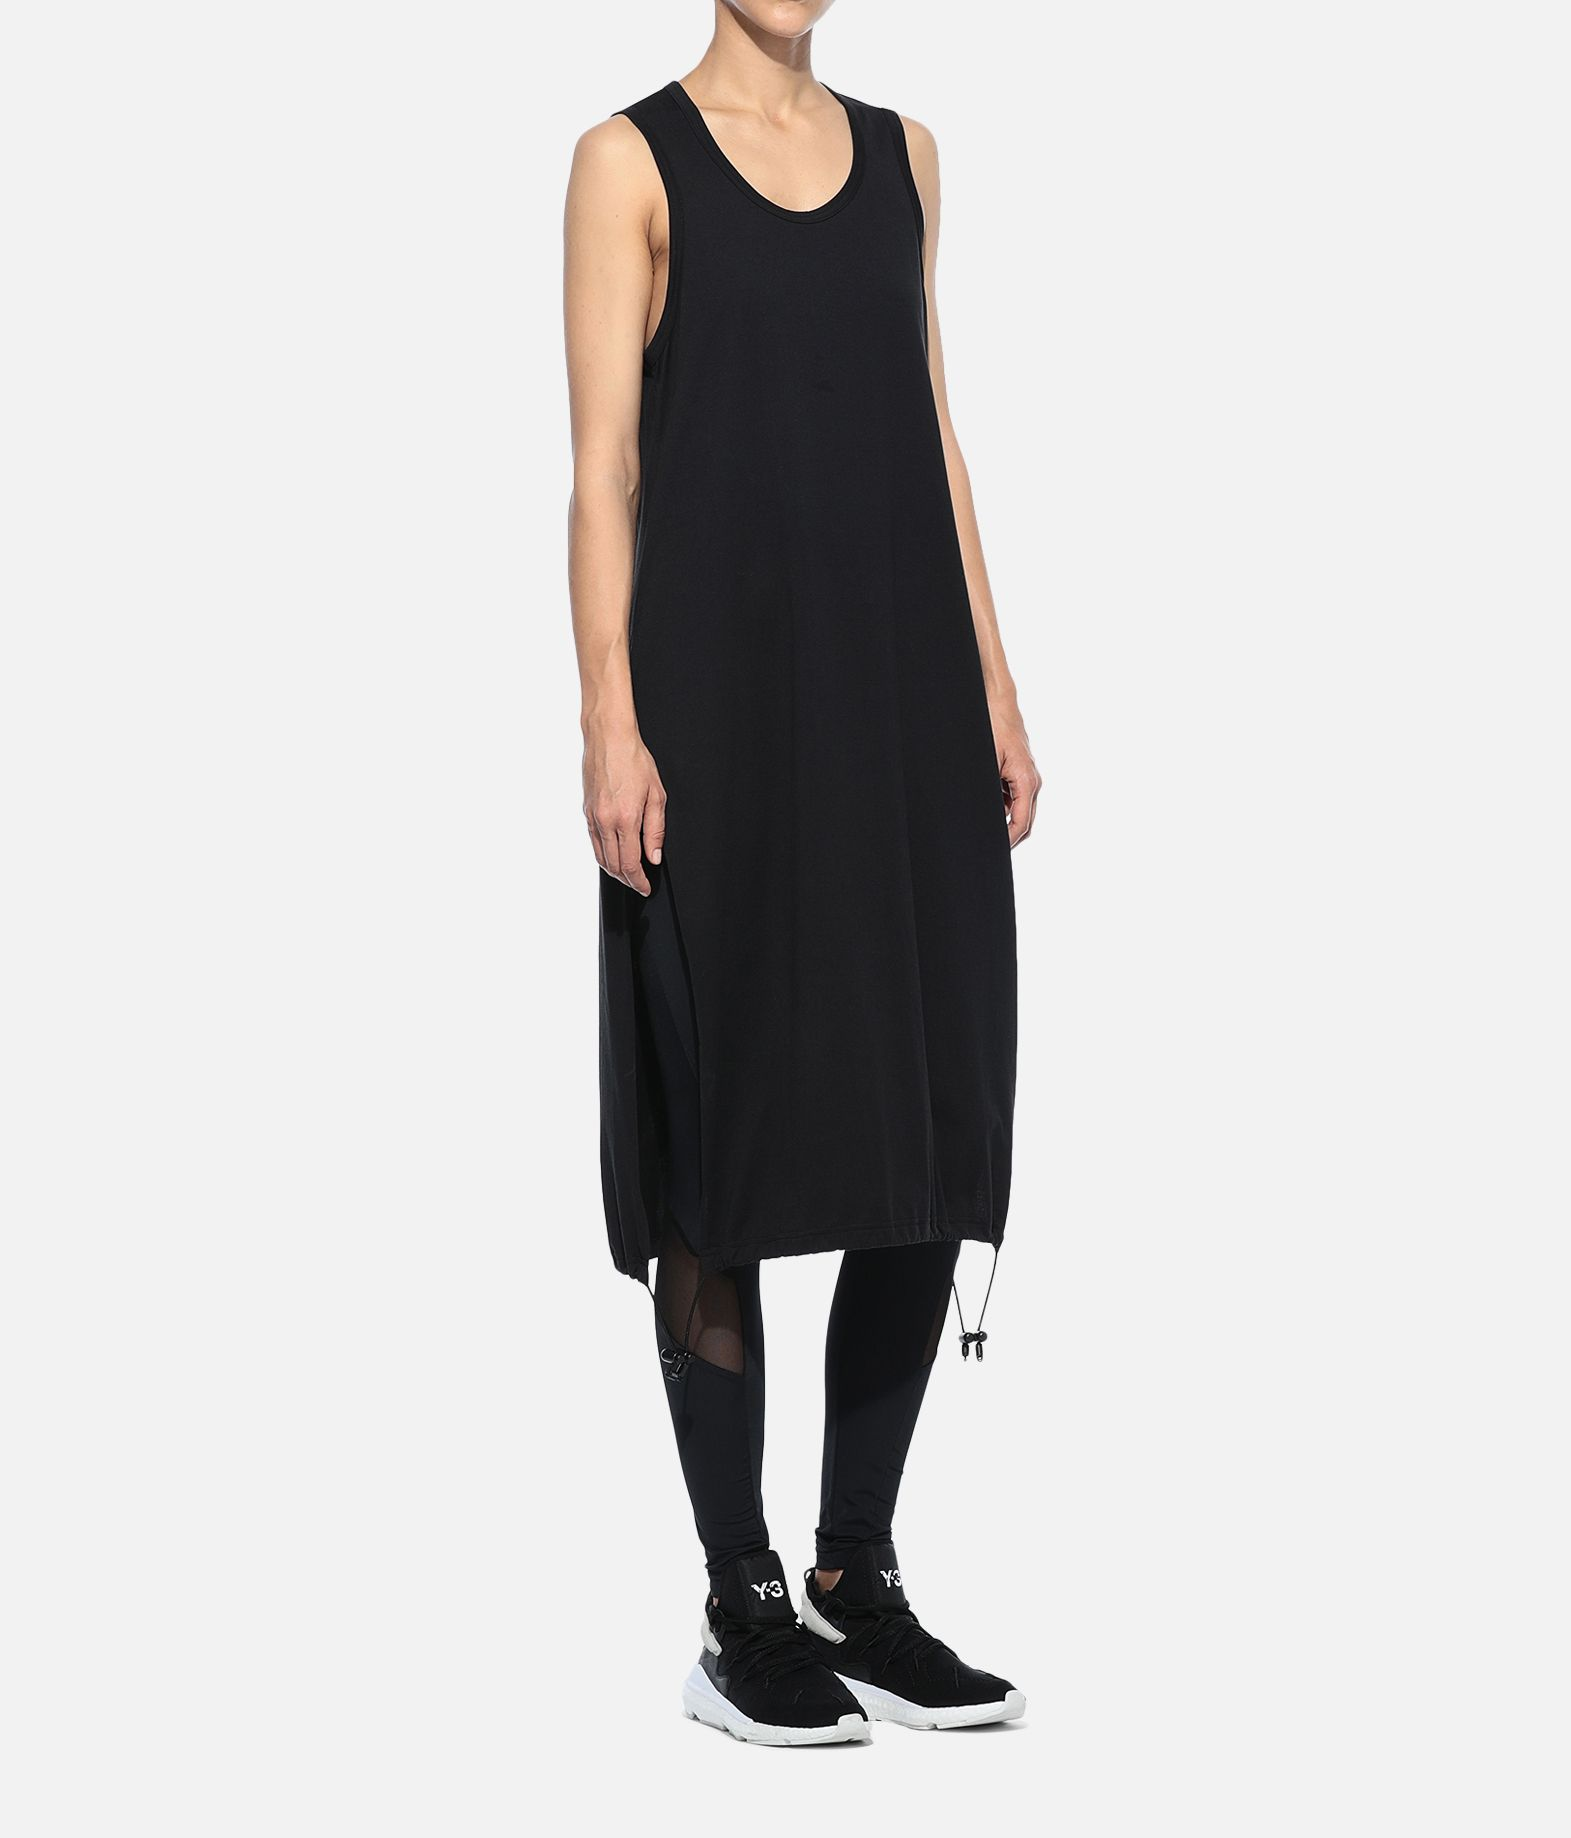 Y-3 Y-3 Drawstring Long Tank Top 3/4 length dress Woman a